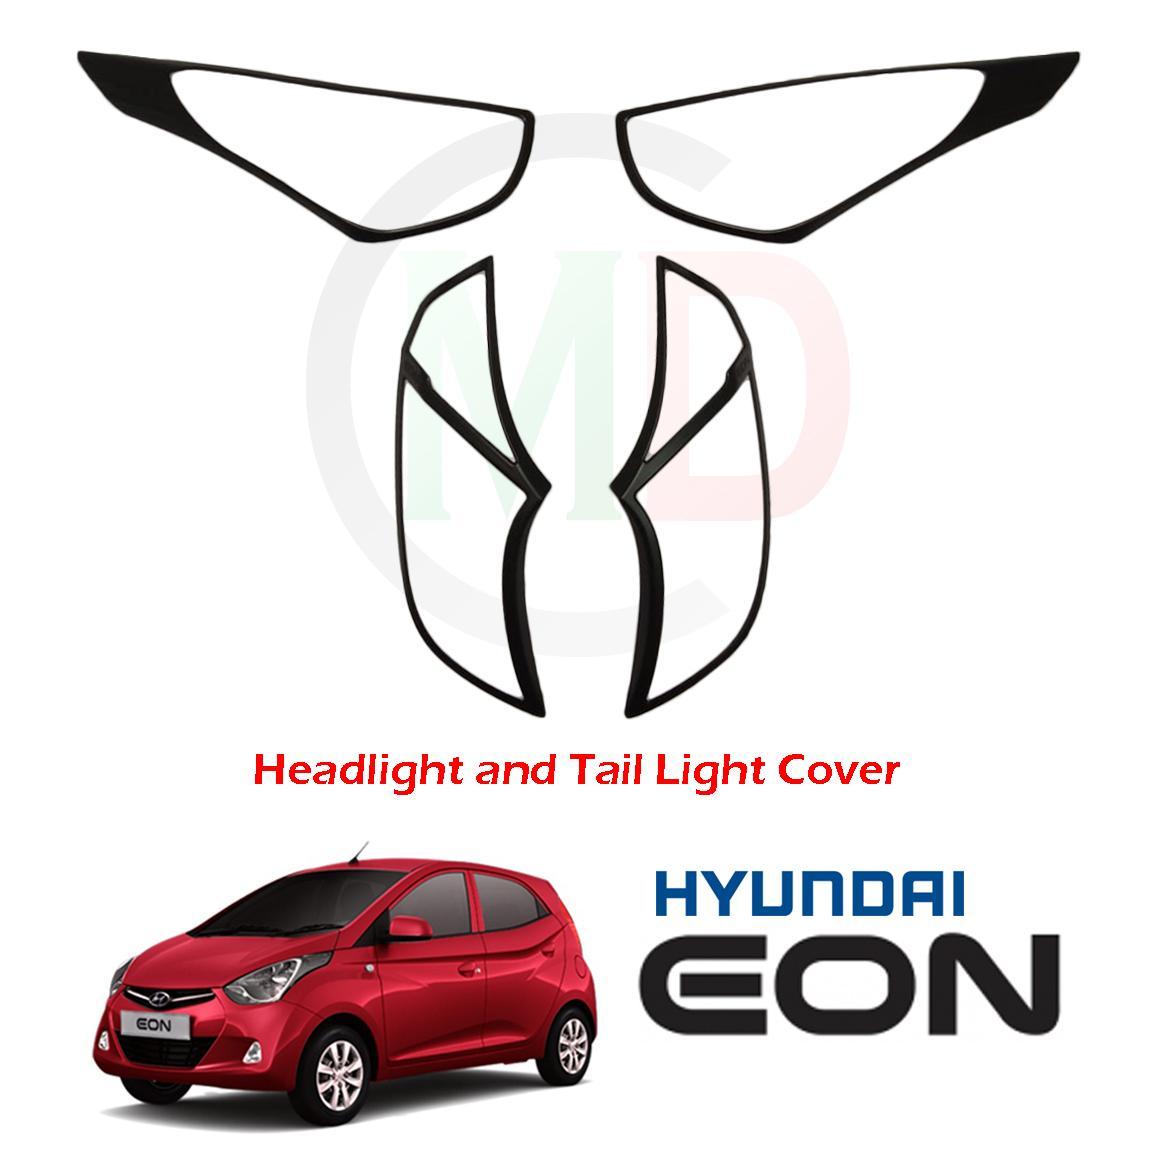 Hyundai Eon 2011-2018 Headlight and Tail light Cover (Matte Black)